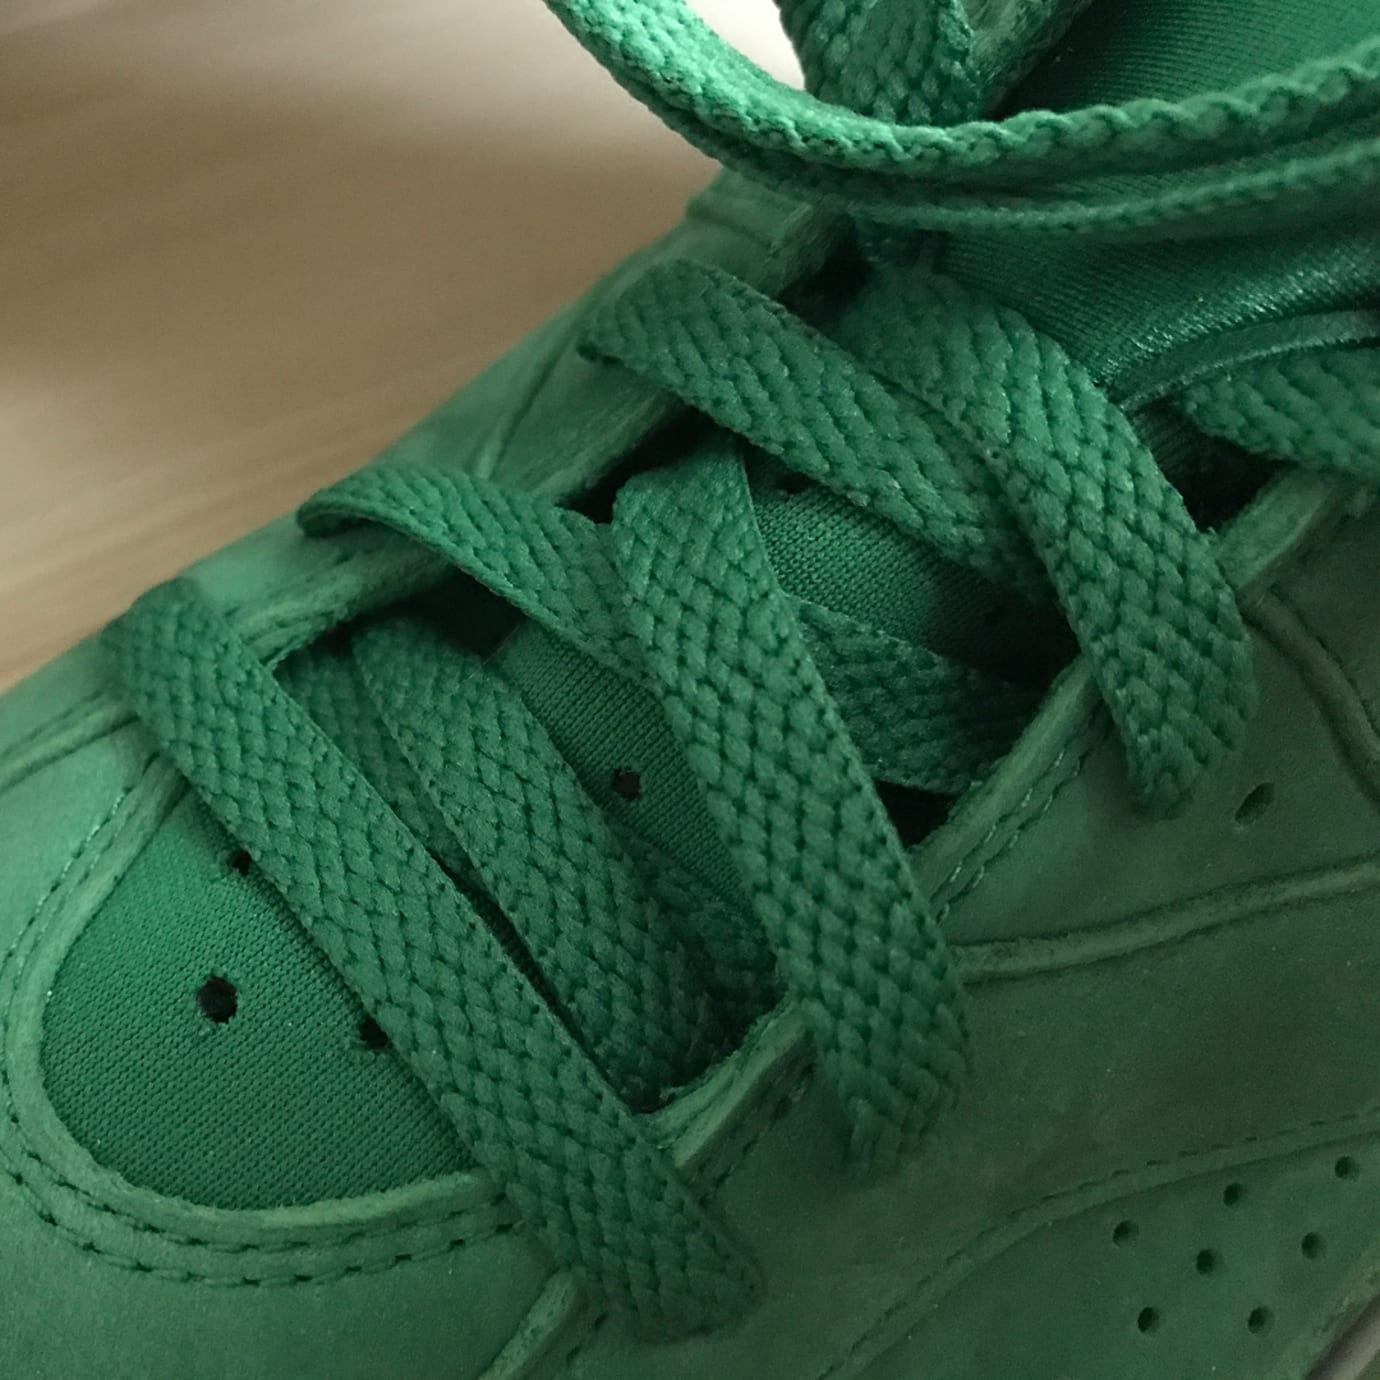 Air Jordan 6 Gatorade Release Date Laces 384664-145